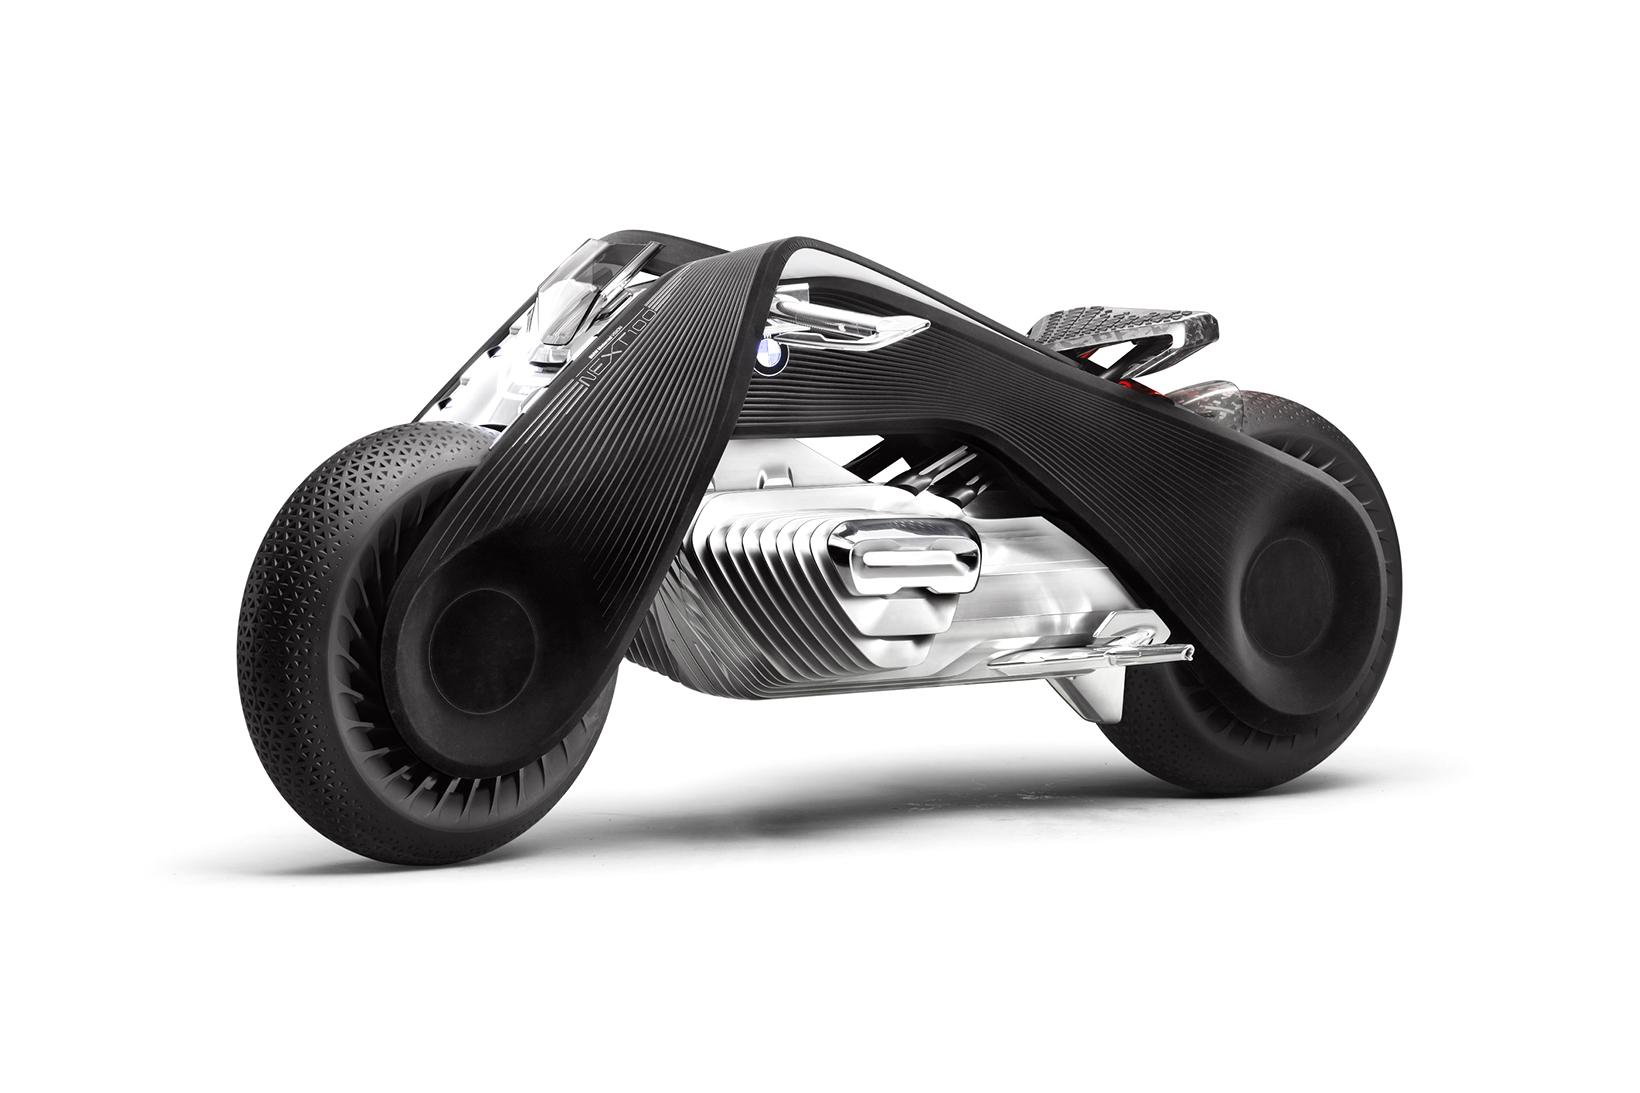 bmw motorrad vision next 100 concept hypebeast. Black Bedroom Furniture Sets. Home Design Ideas